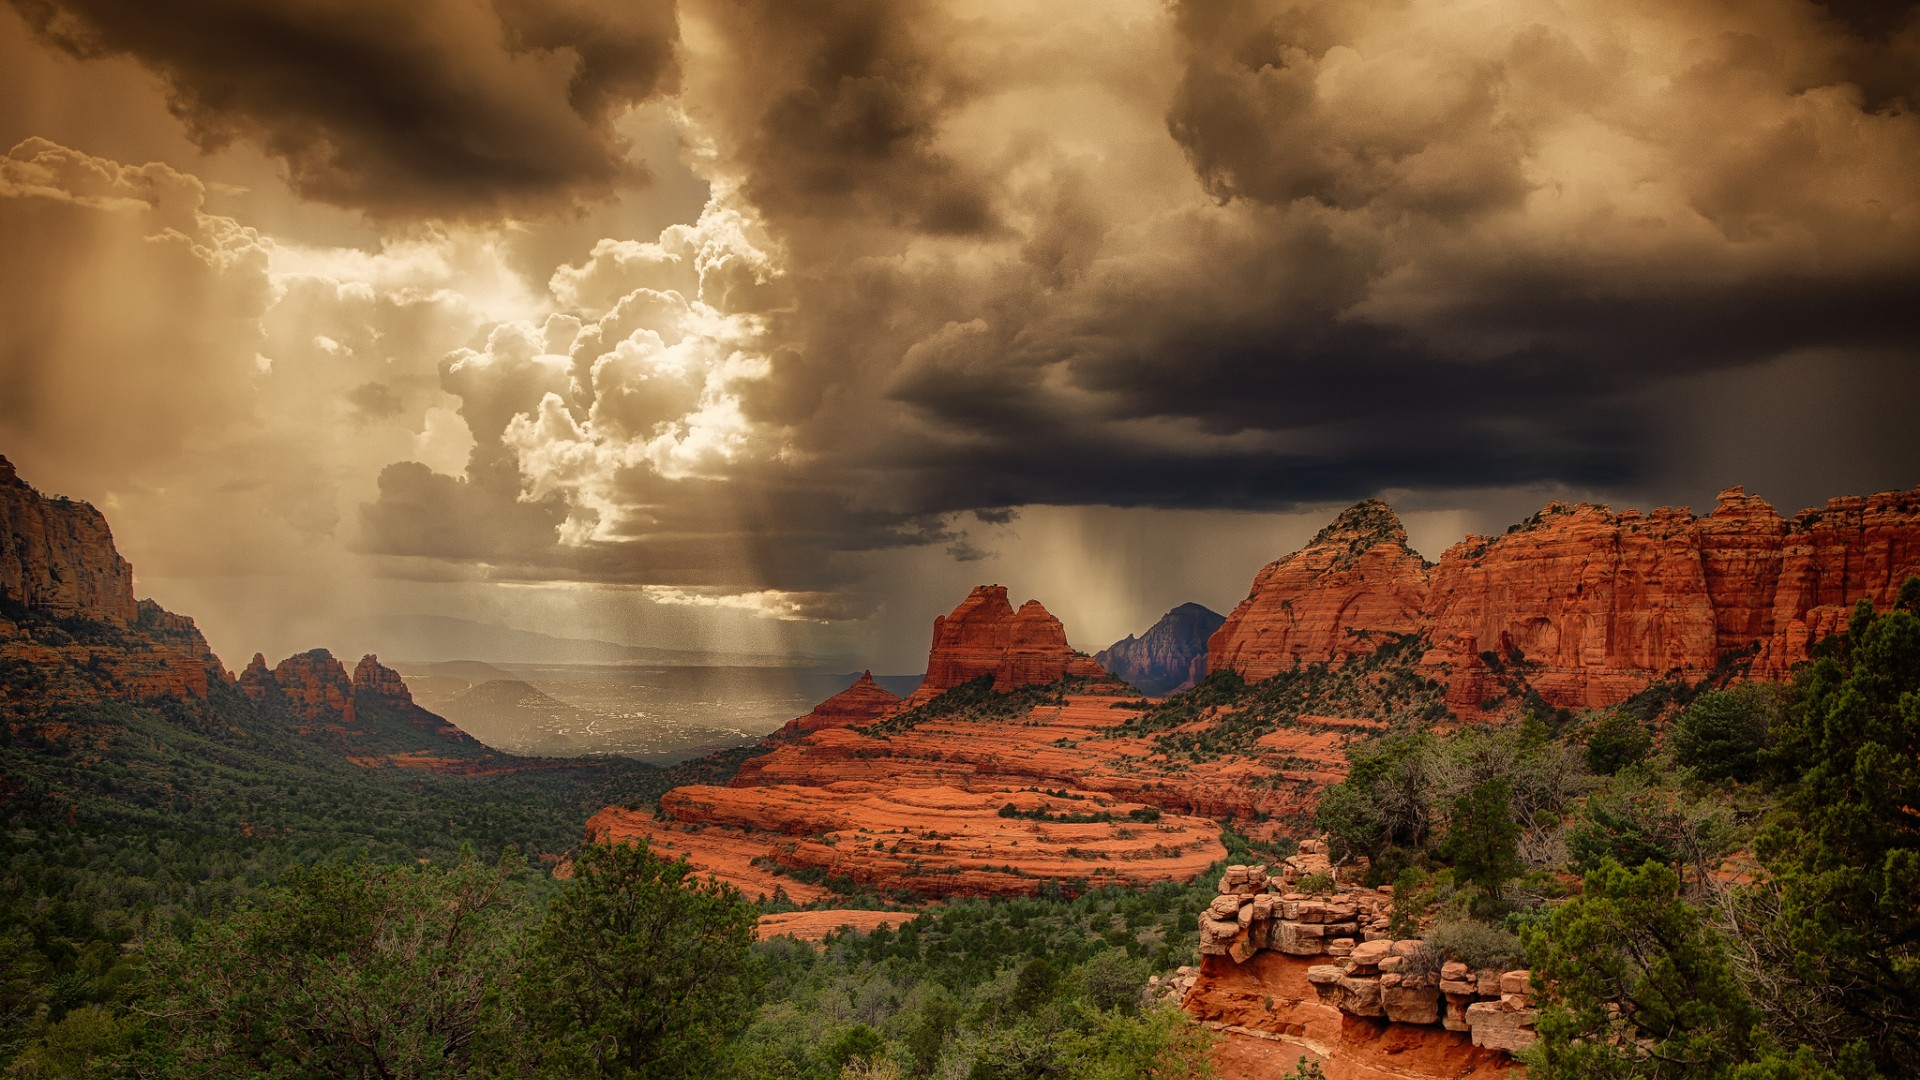 Desktop wallpapers Storm clouds over the red rocks of Sedona Arizona 1920x1080